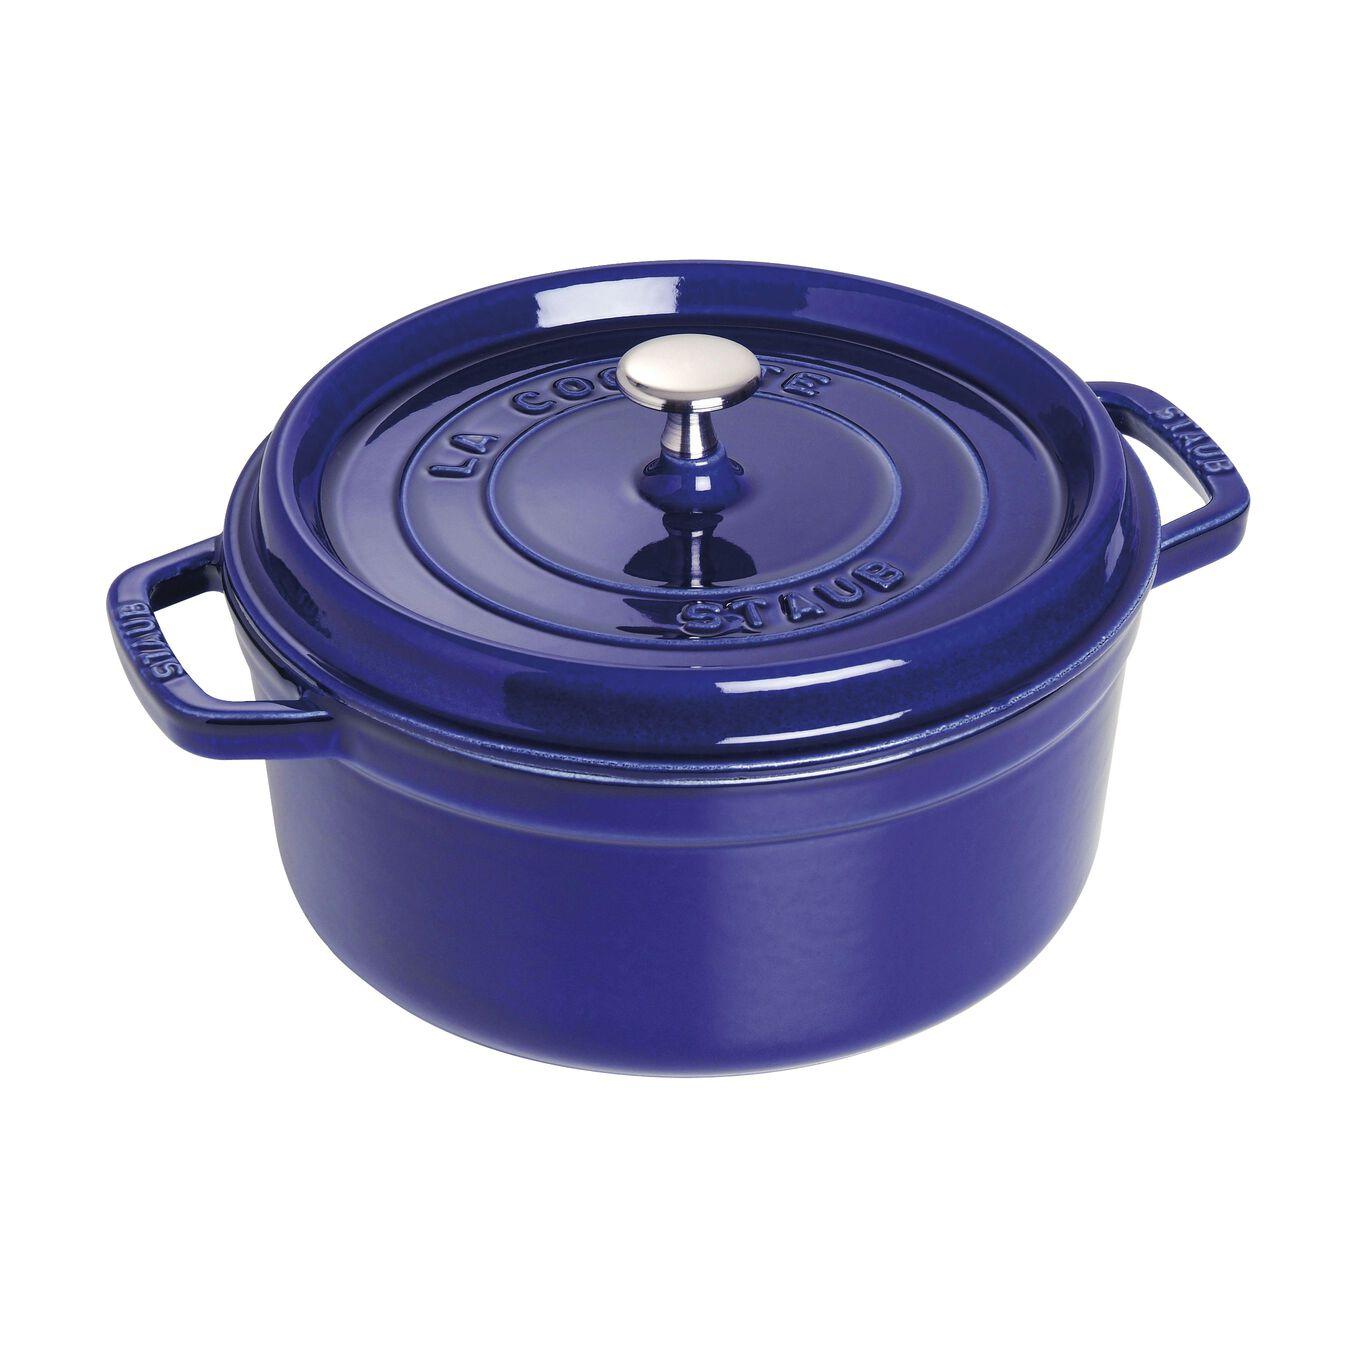 2.75-qt Round Cocotte - Dark Blue,,large 1